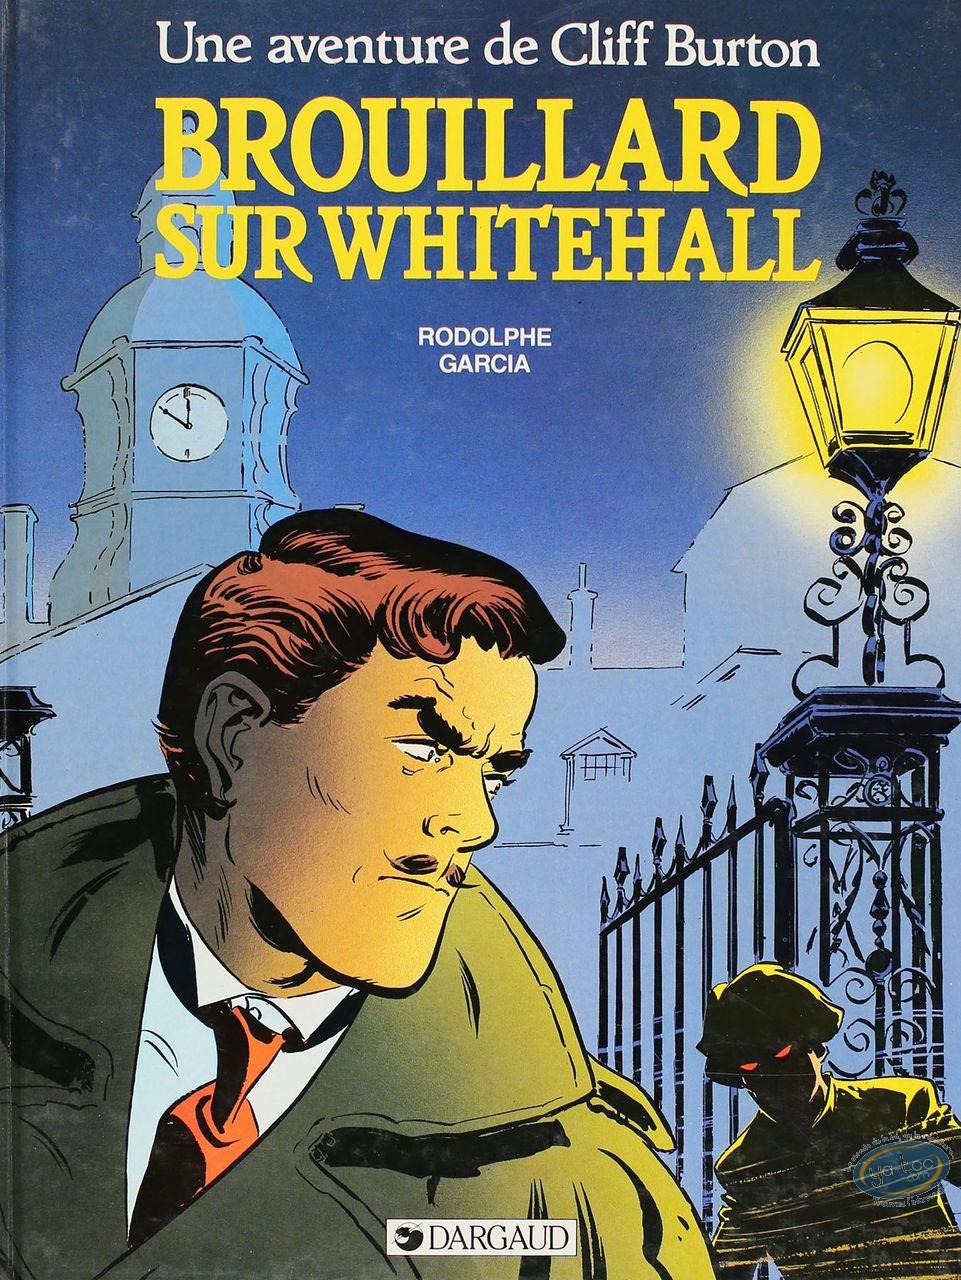 Listed European Comic Books, Cliff Burton : Brouillard sur Whitehall